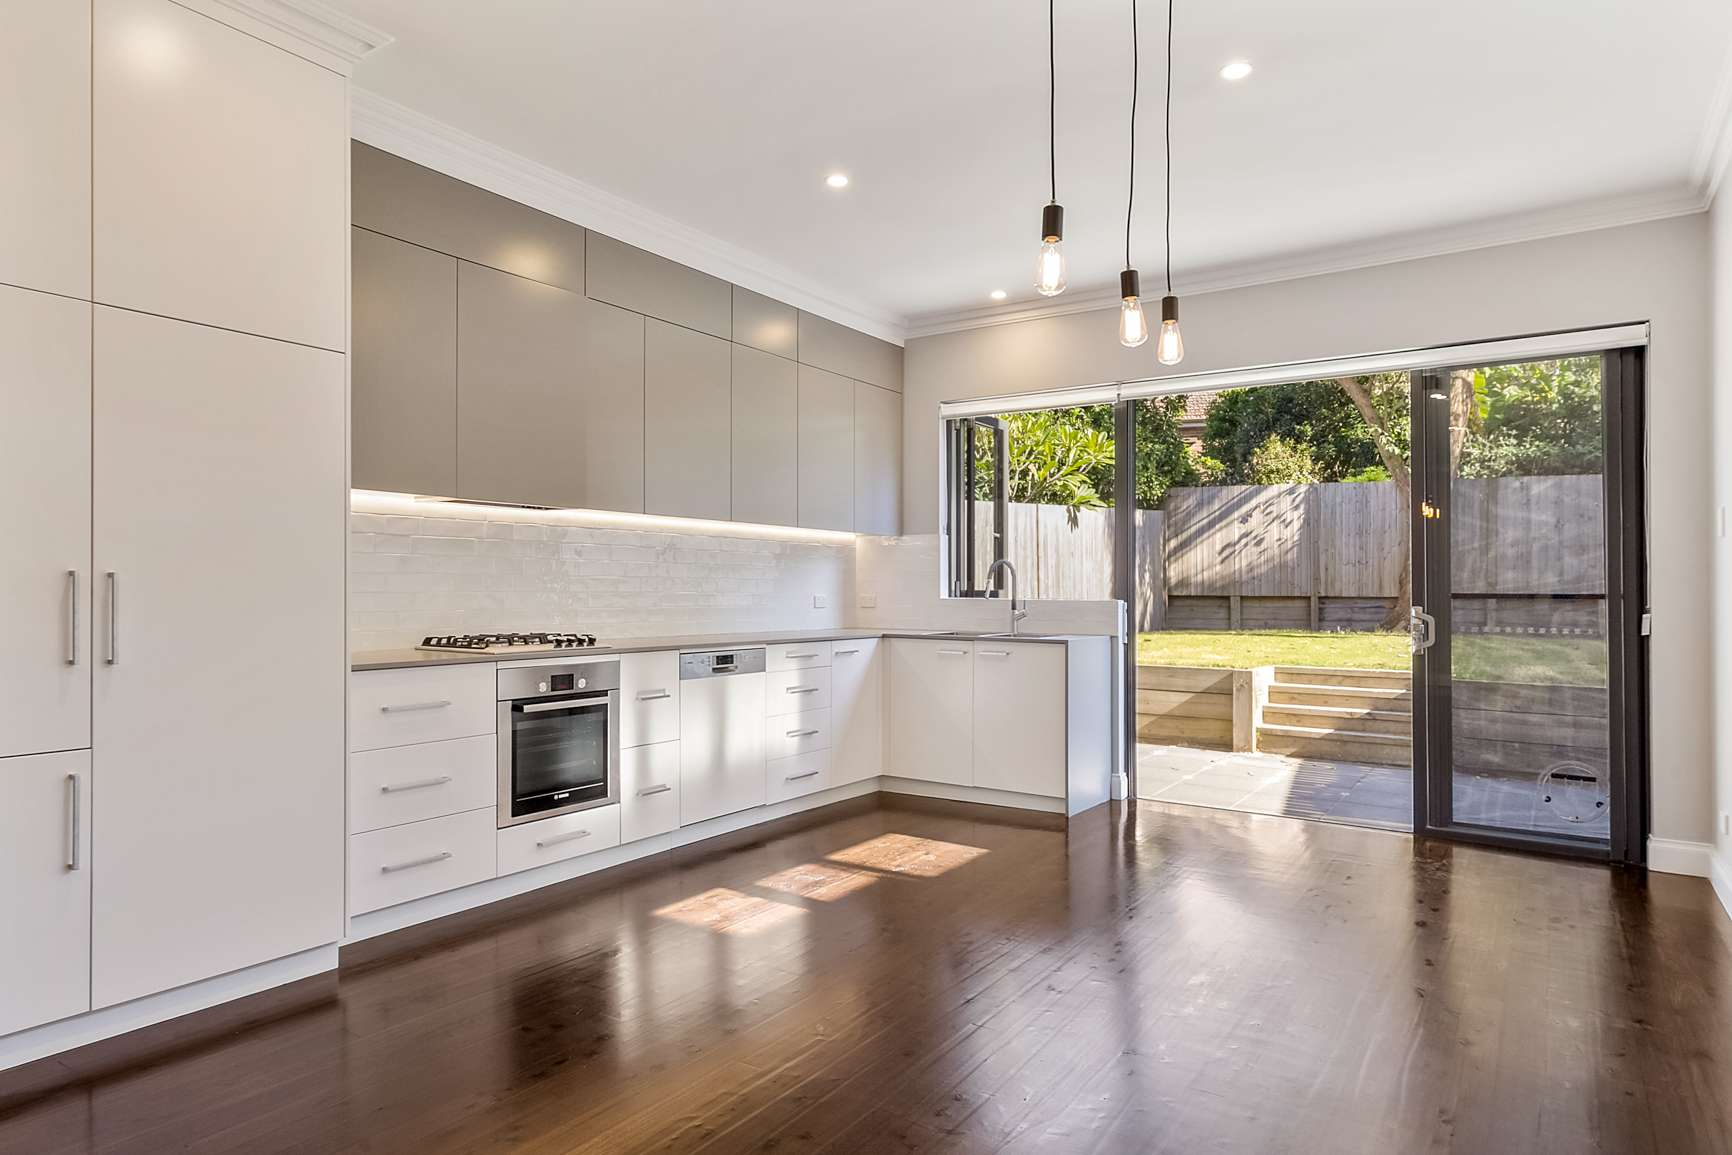 430 Avoca St, Kingsford NSW 2032